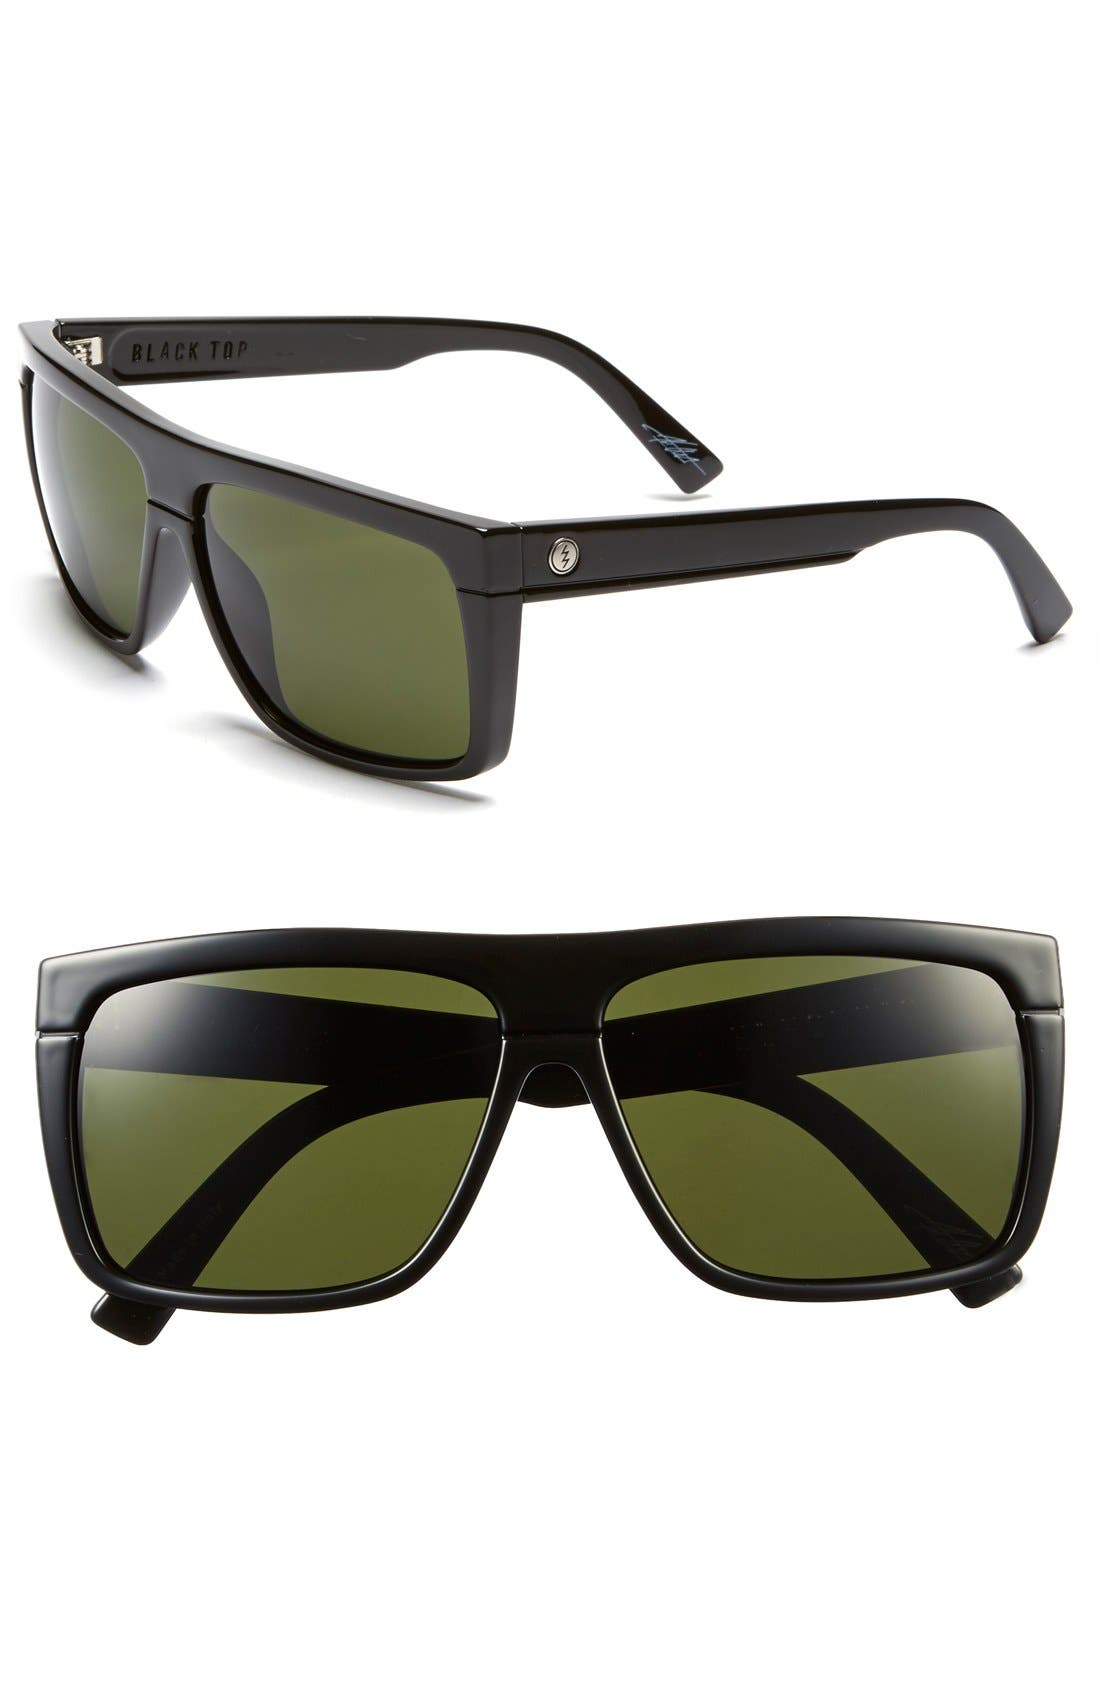 Alternate Image 1 Selected - ELECTRIC 'Black Top' 61mm Flat Top Sunglasses